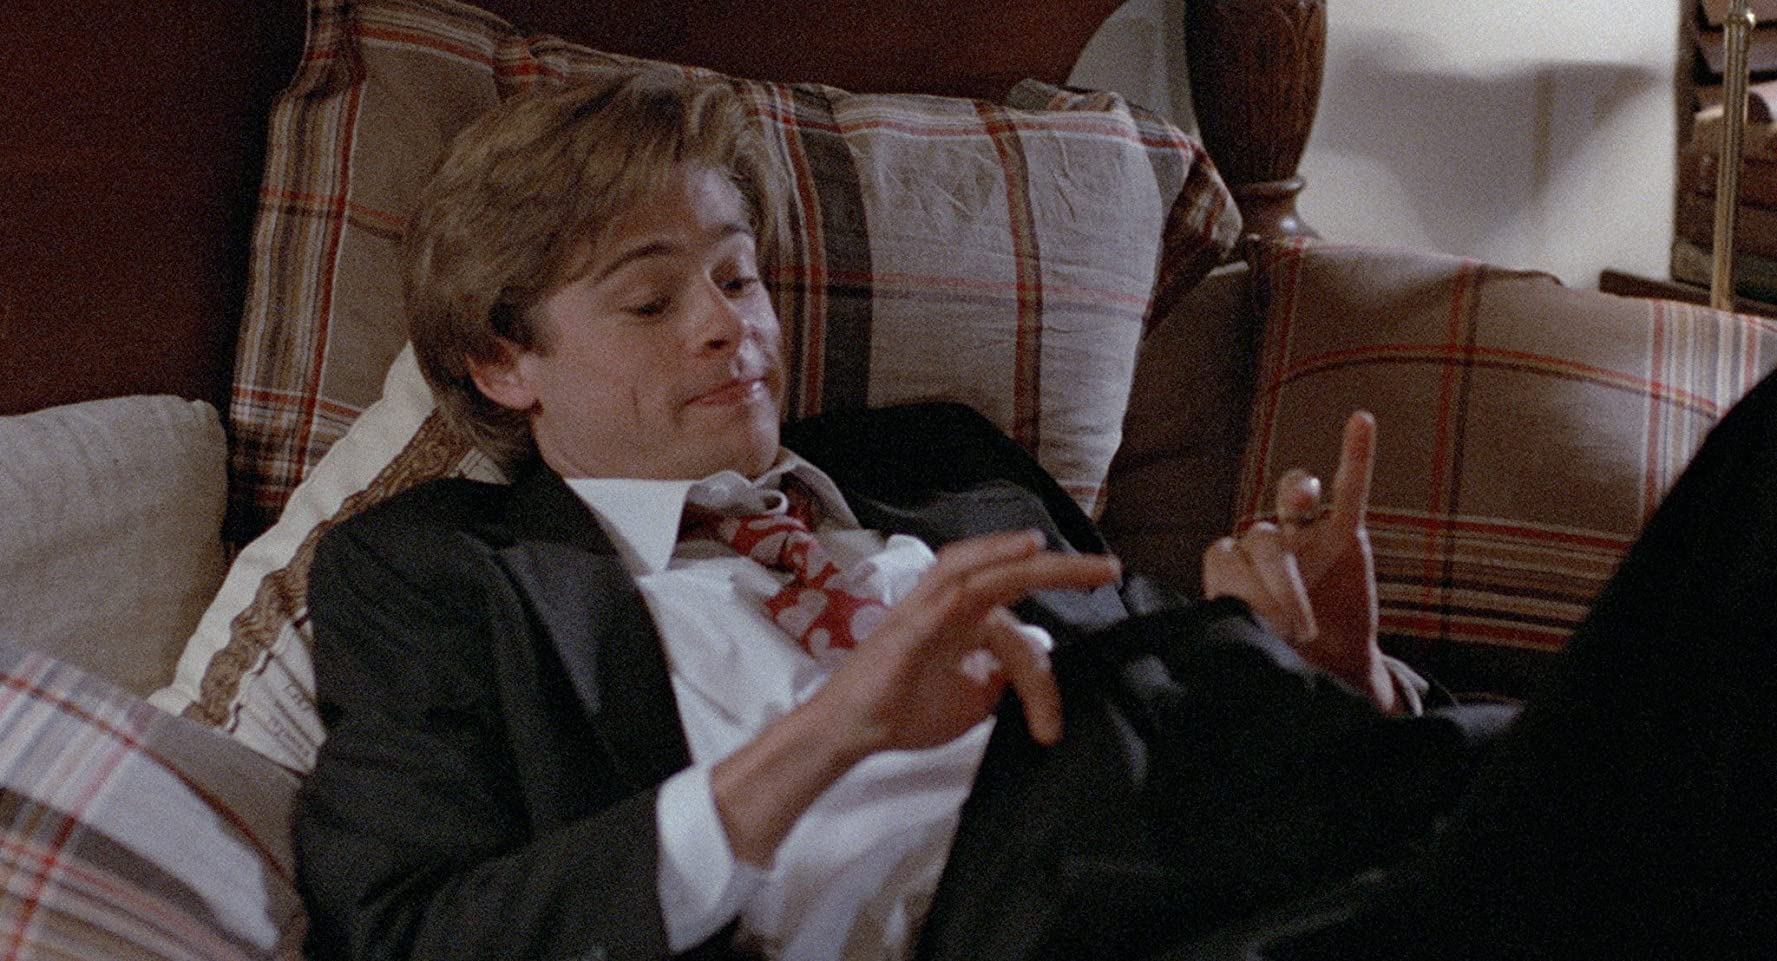 Пропуск занятий (Cutting Class)1989 Брэд Питт